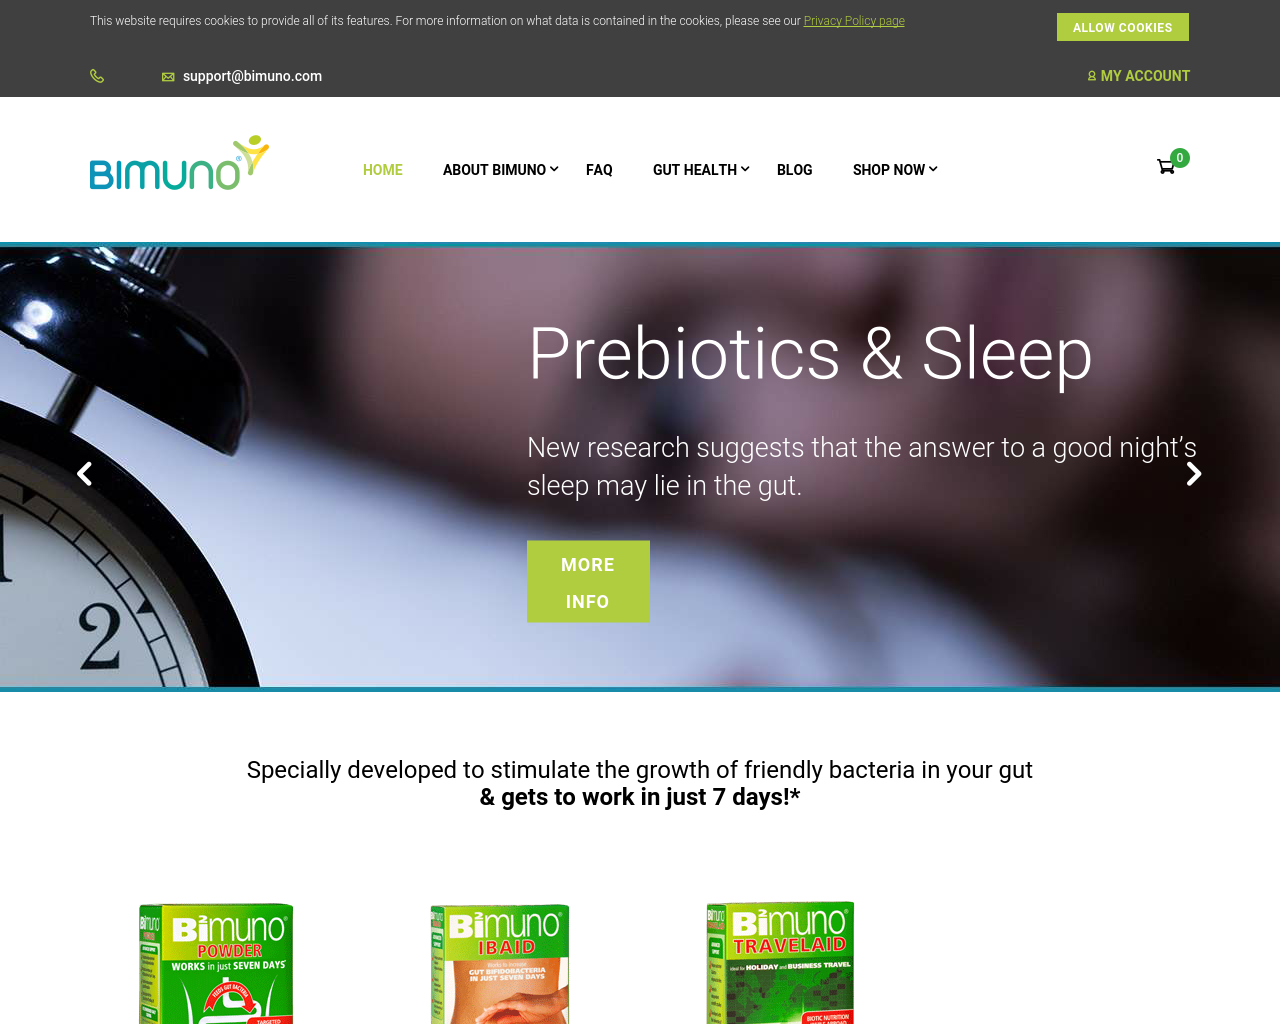 Bimuno-Advertising-Reviews-Pricing